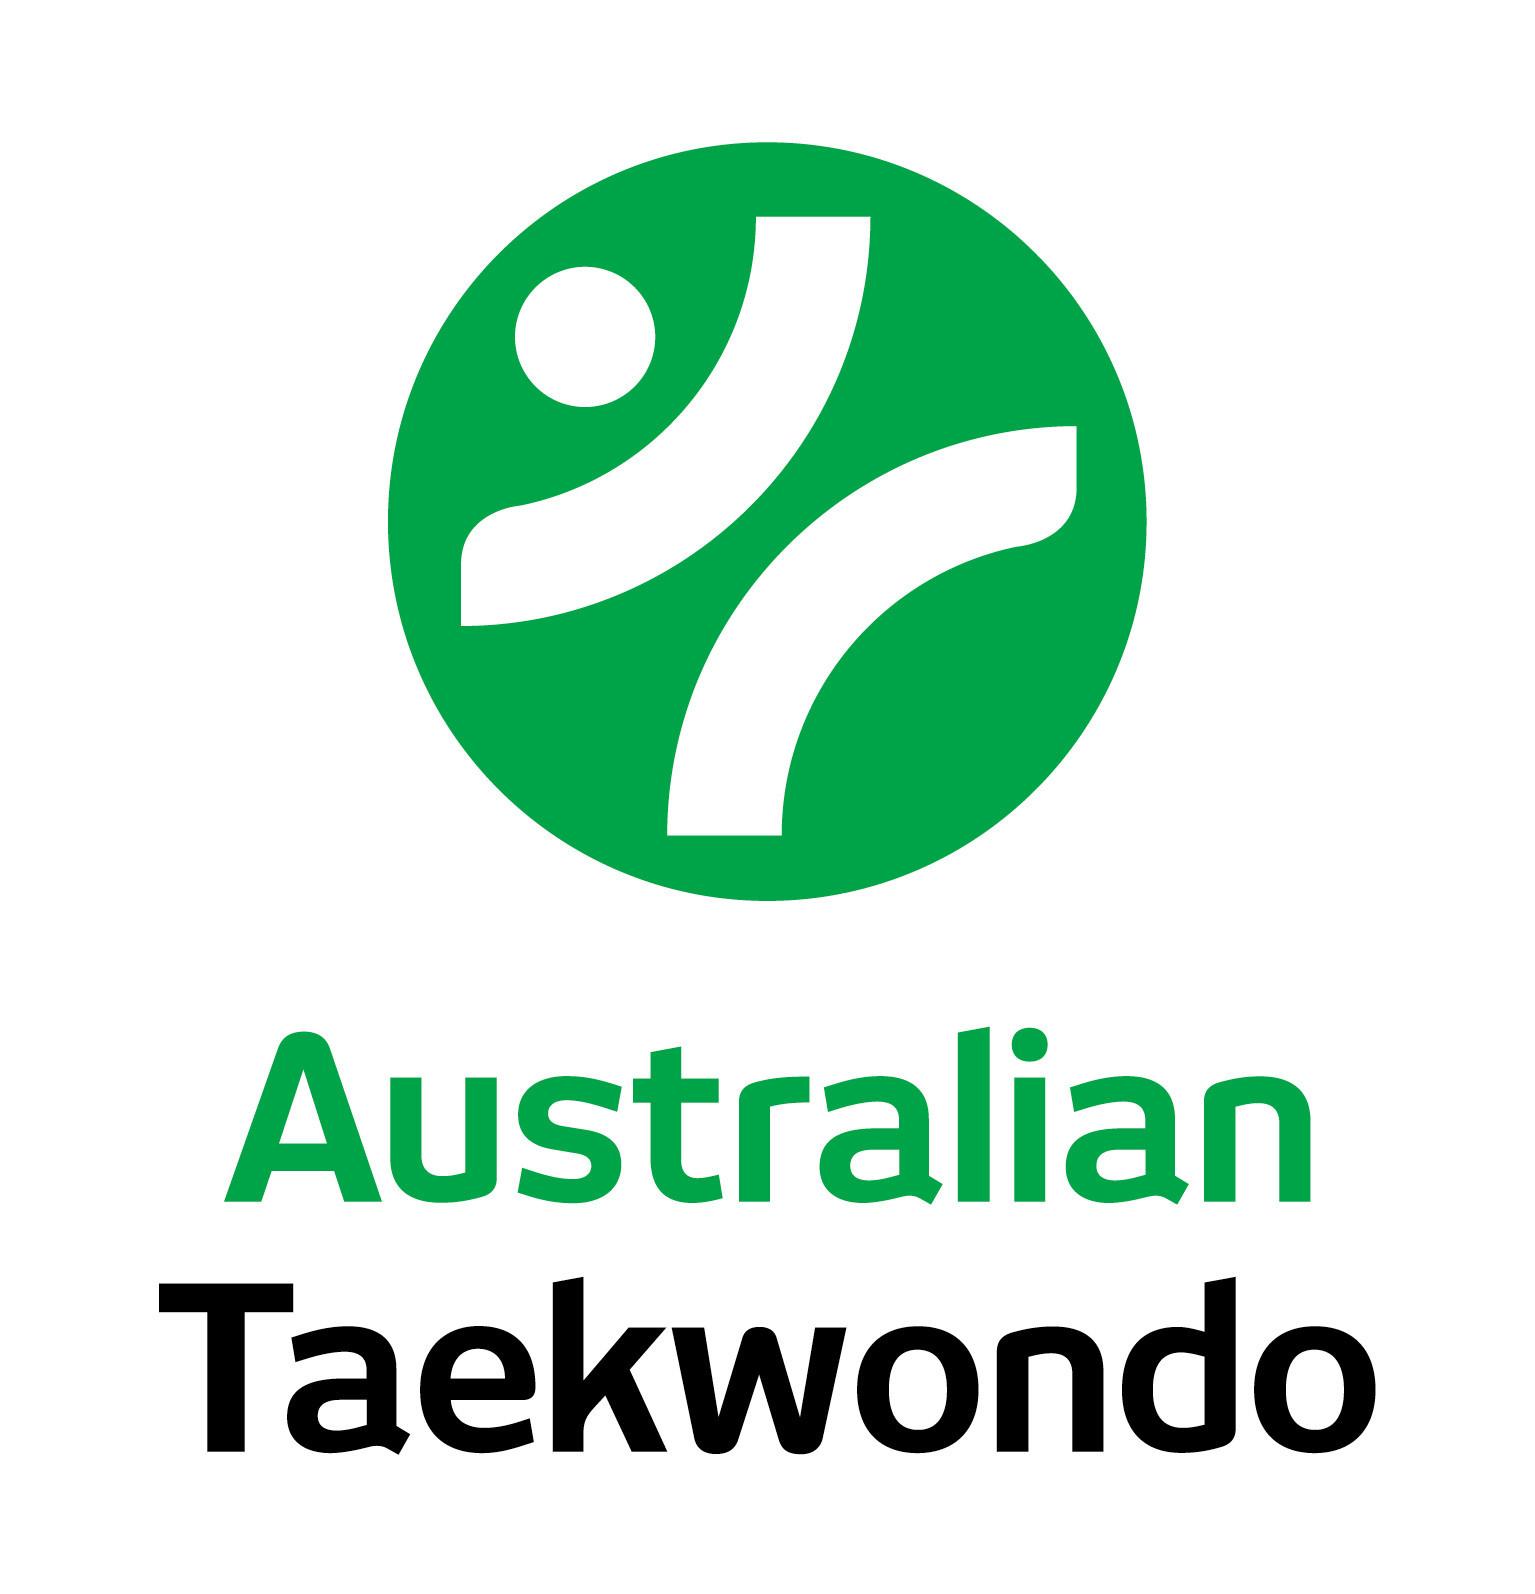 Australian Taekwondo announce partnership with marketing company as part of rebrand